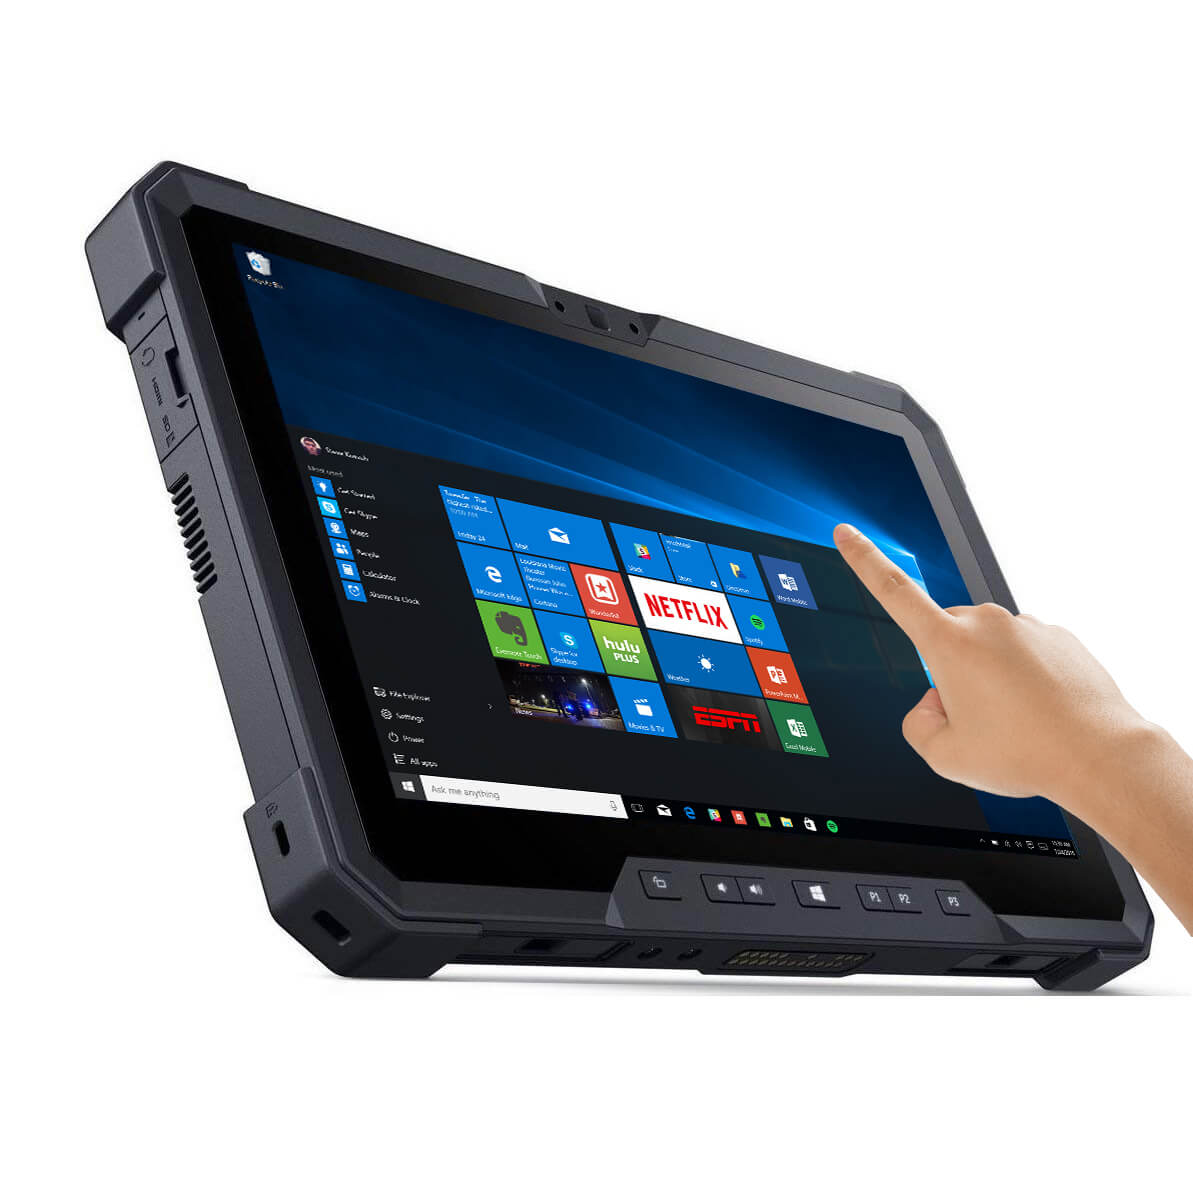 Dell Latitude 7212 Rugged Extreme 12 Tablet Laptop Intel I5 16gb 256gb Ssd Walmart Com Walmart Com